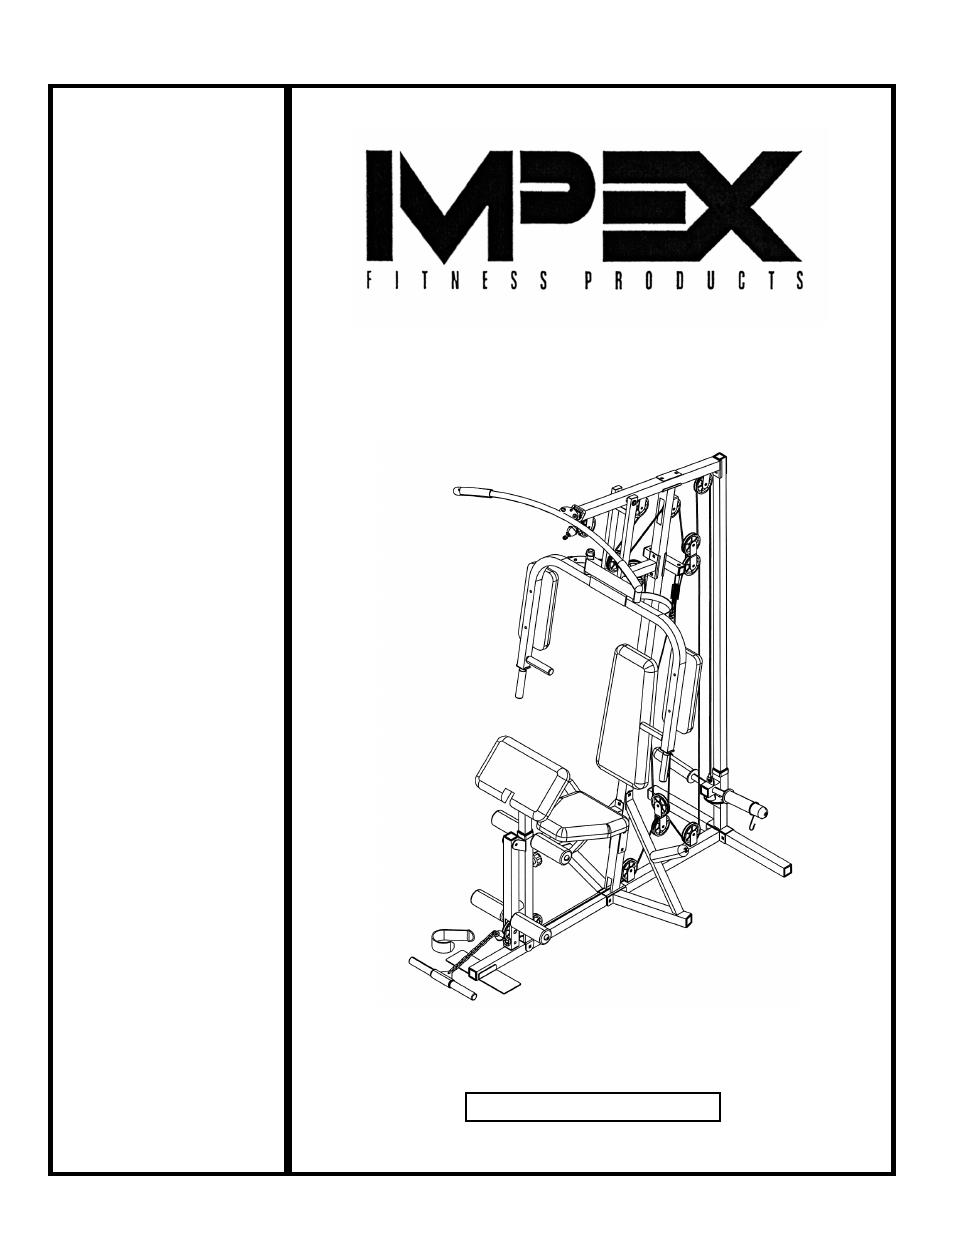 Home Images Fax Internet Diagram Pdf Fax Internet Diagram Pdf Facebook